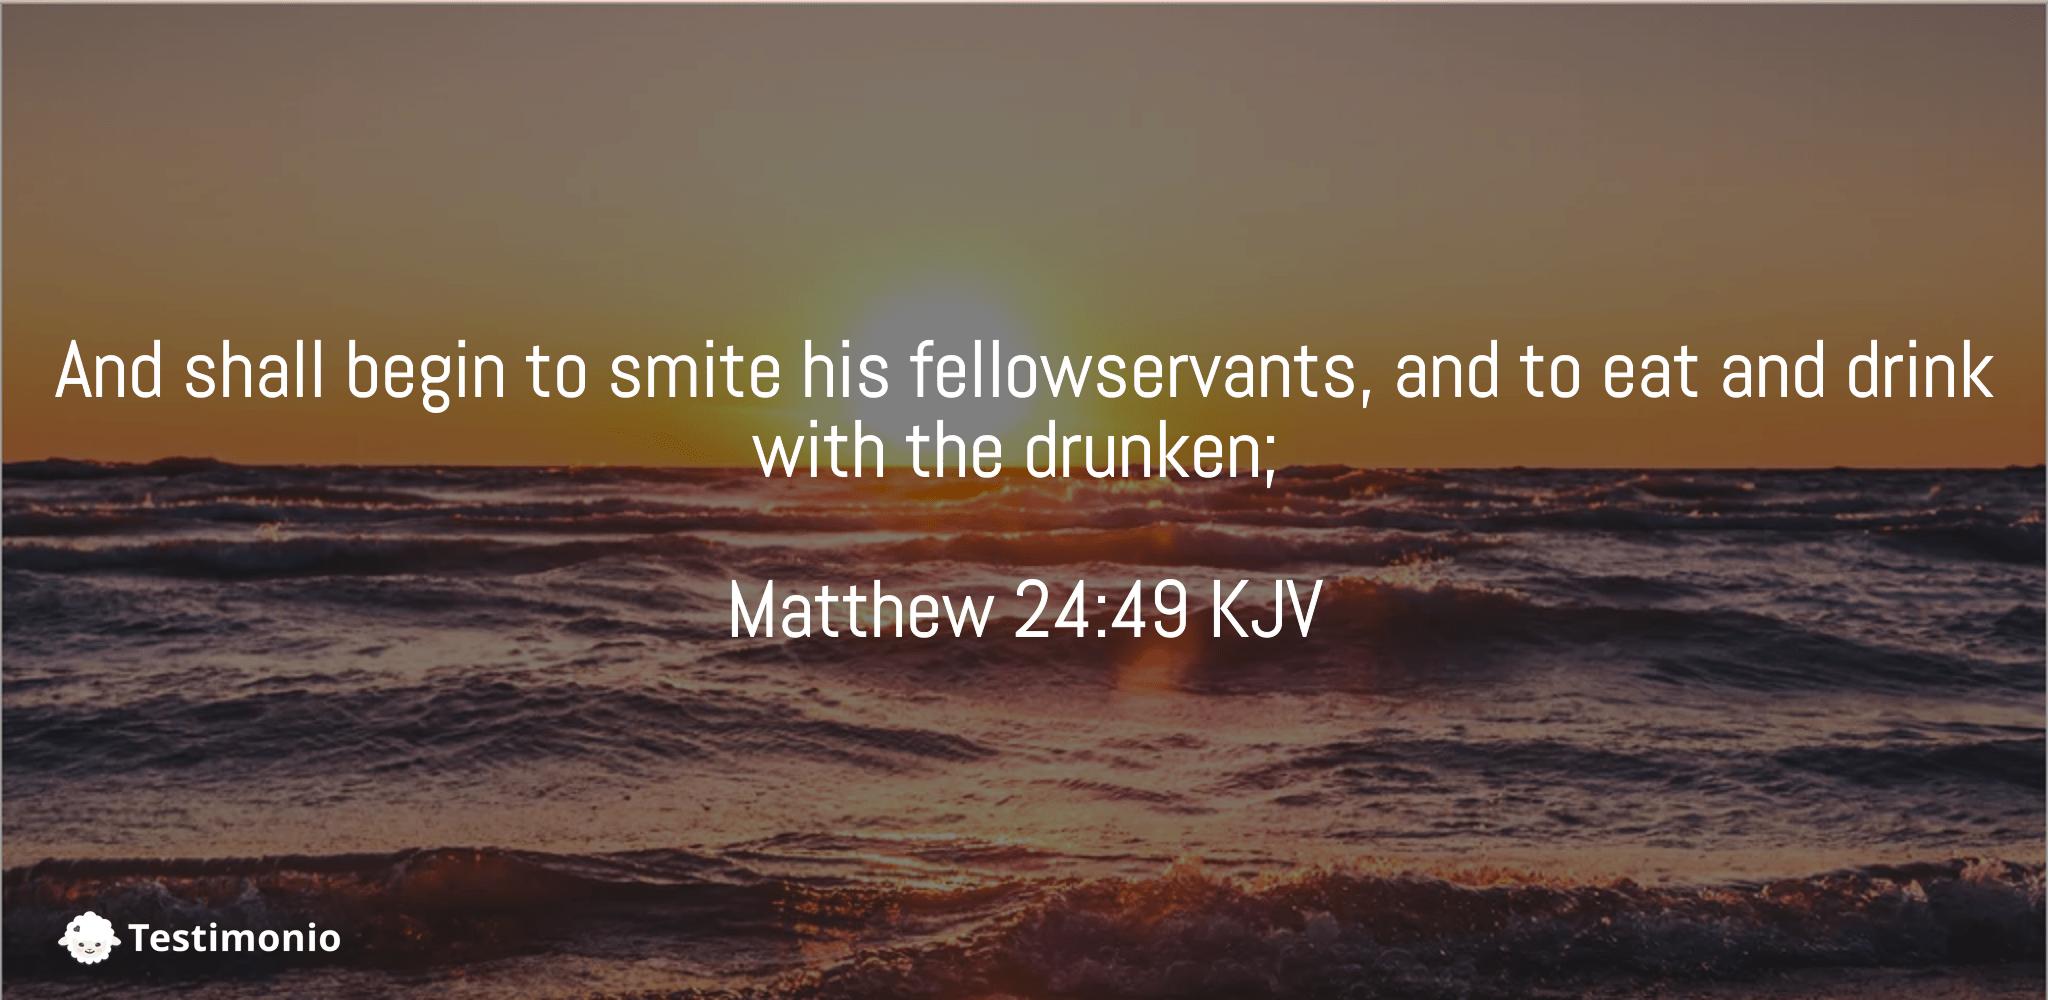 Matthew 24:49